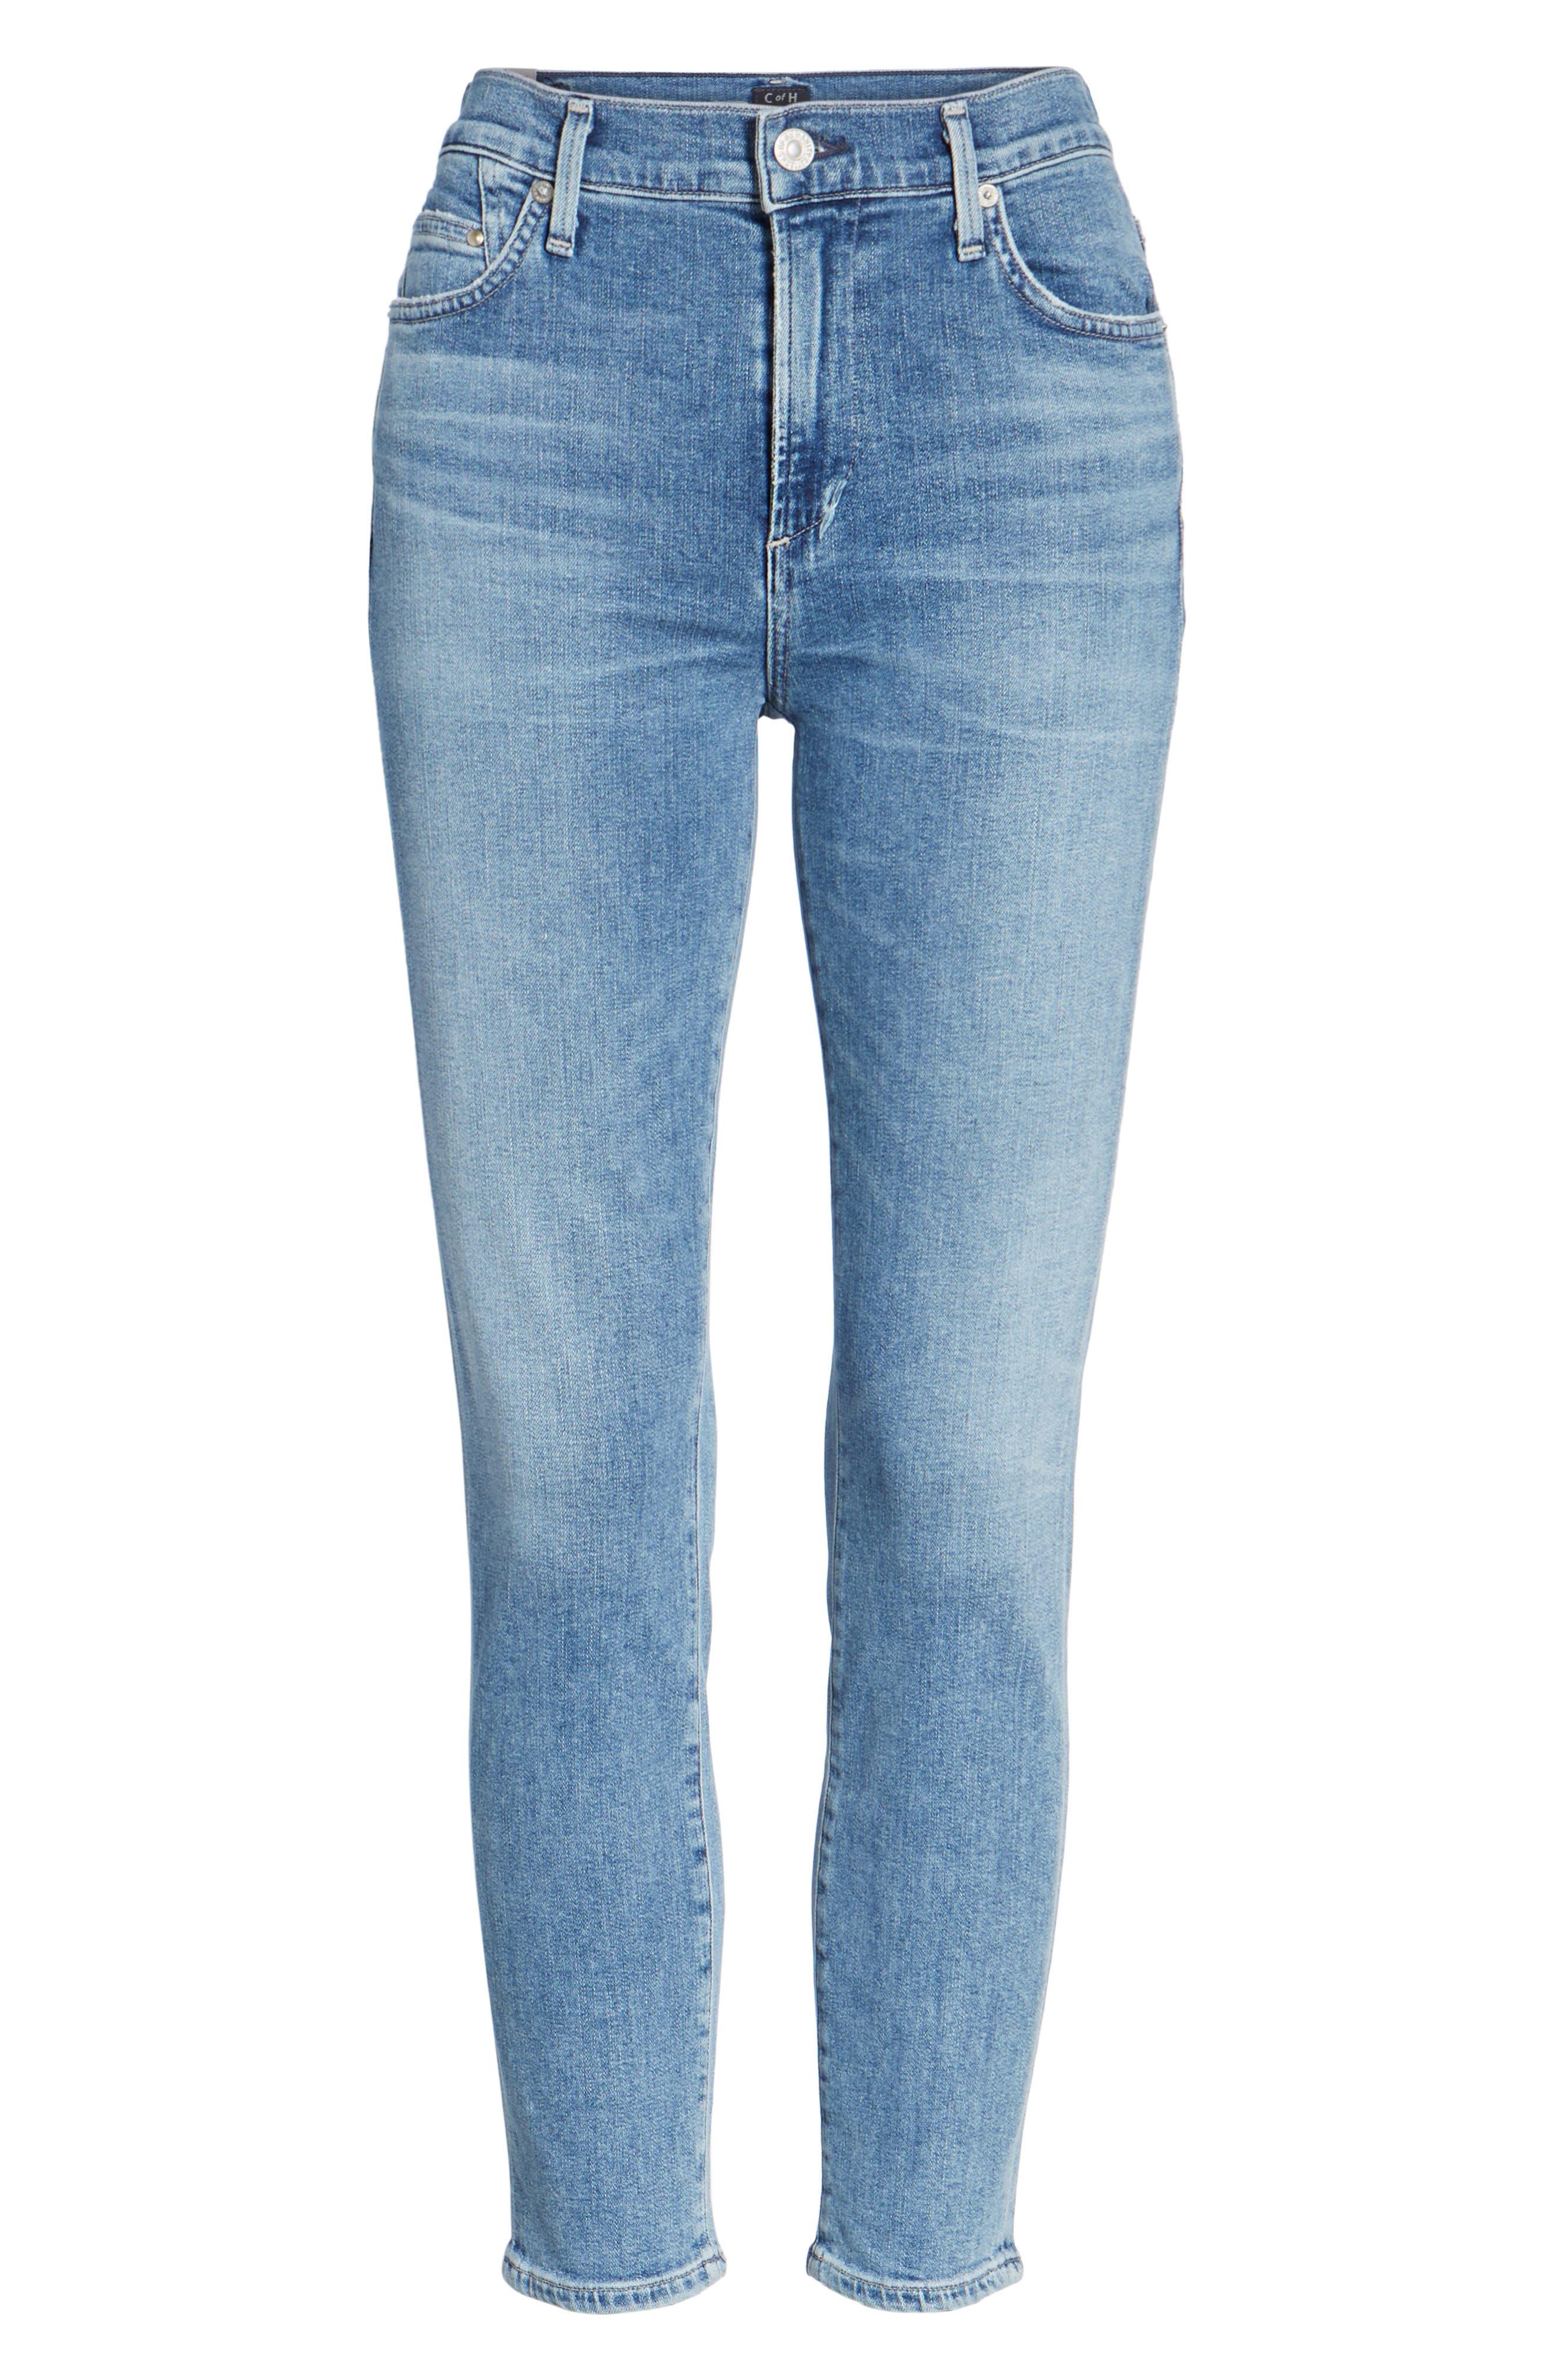 Rocket High Waist Crop Skinny Jeans,                         Main,                         color, 424